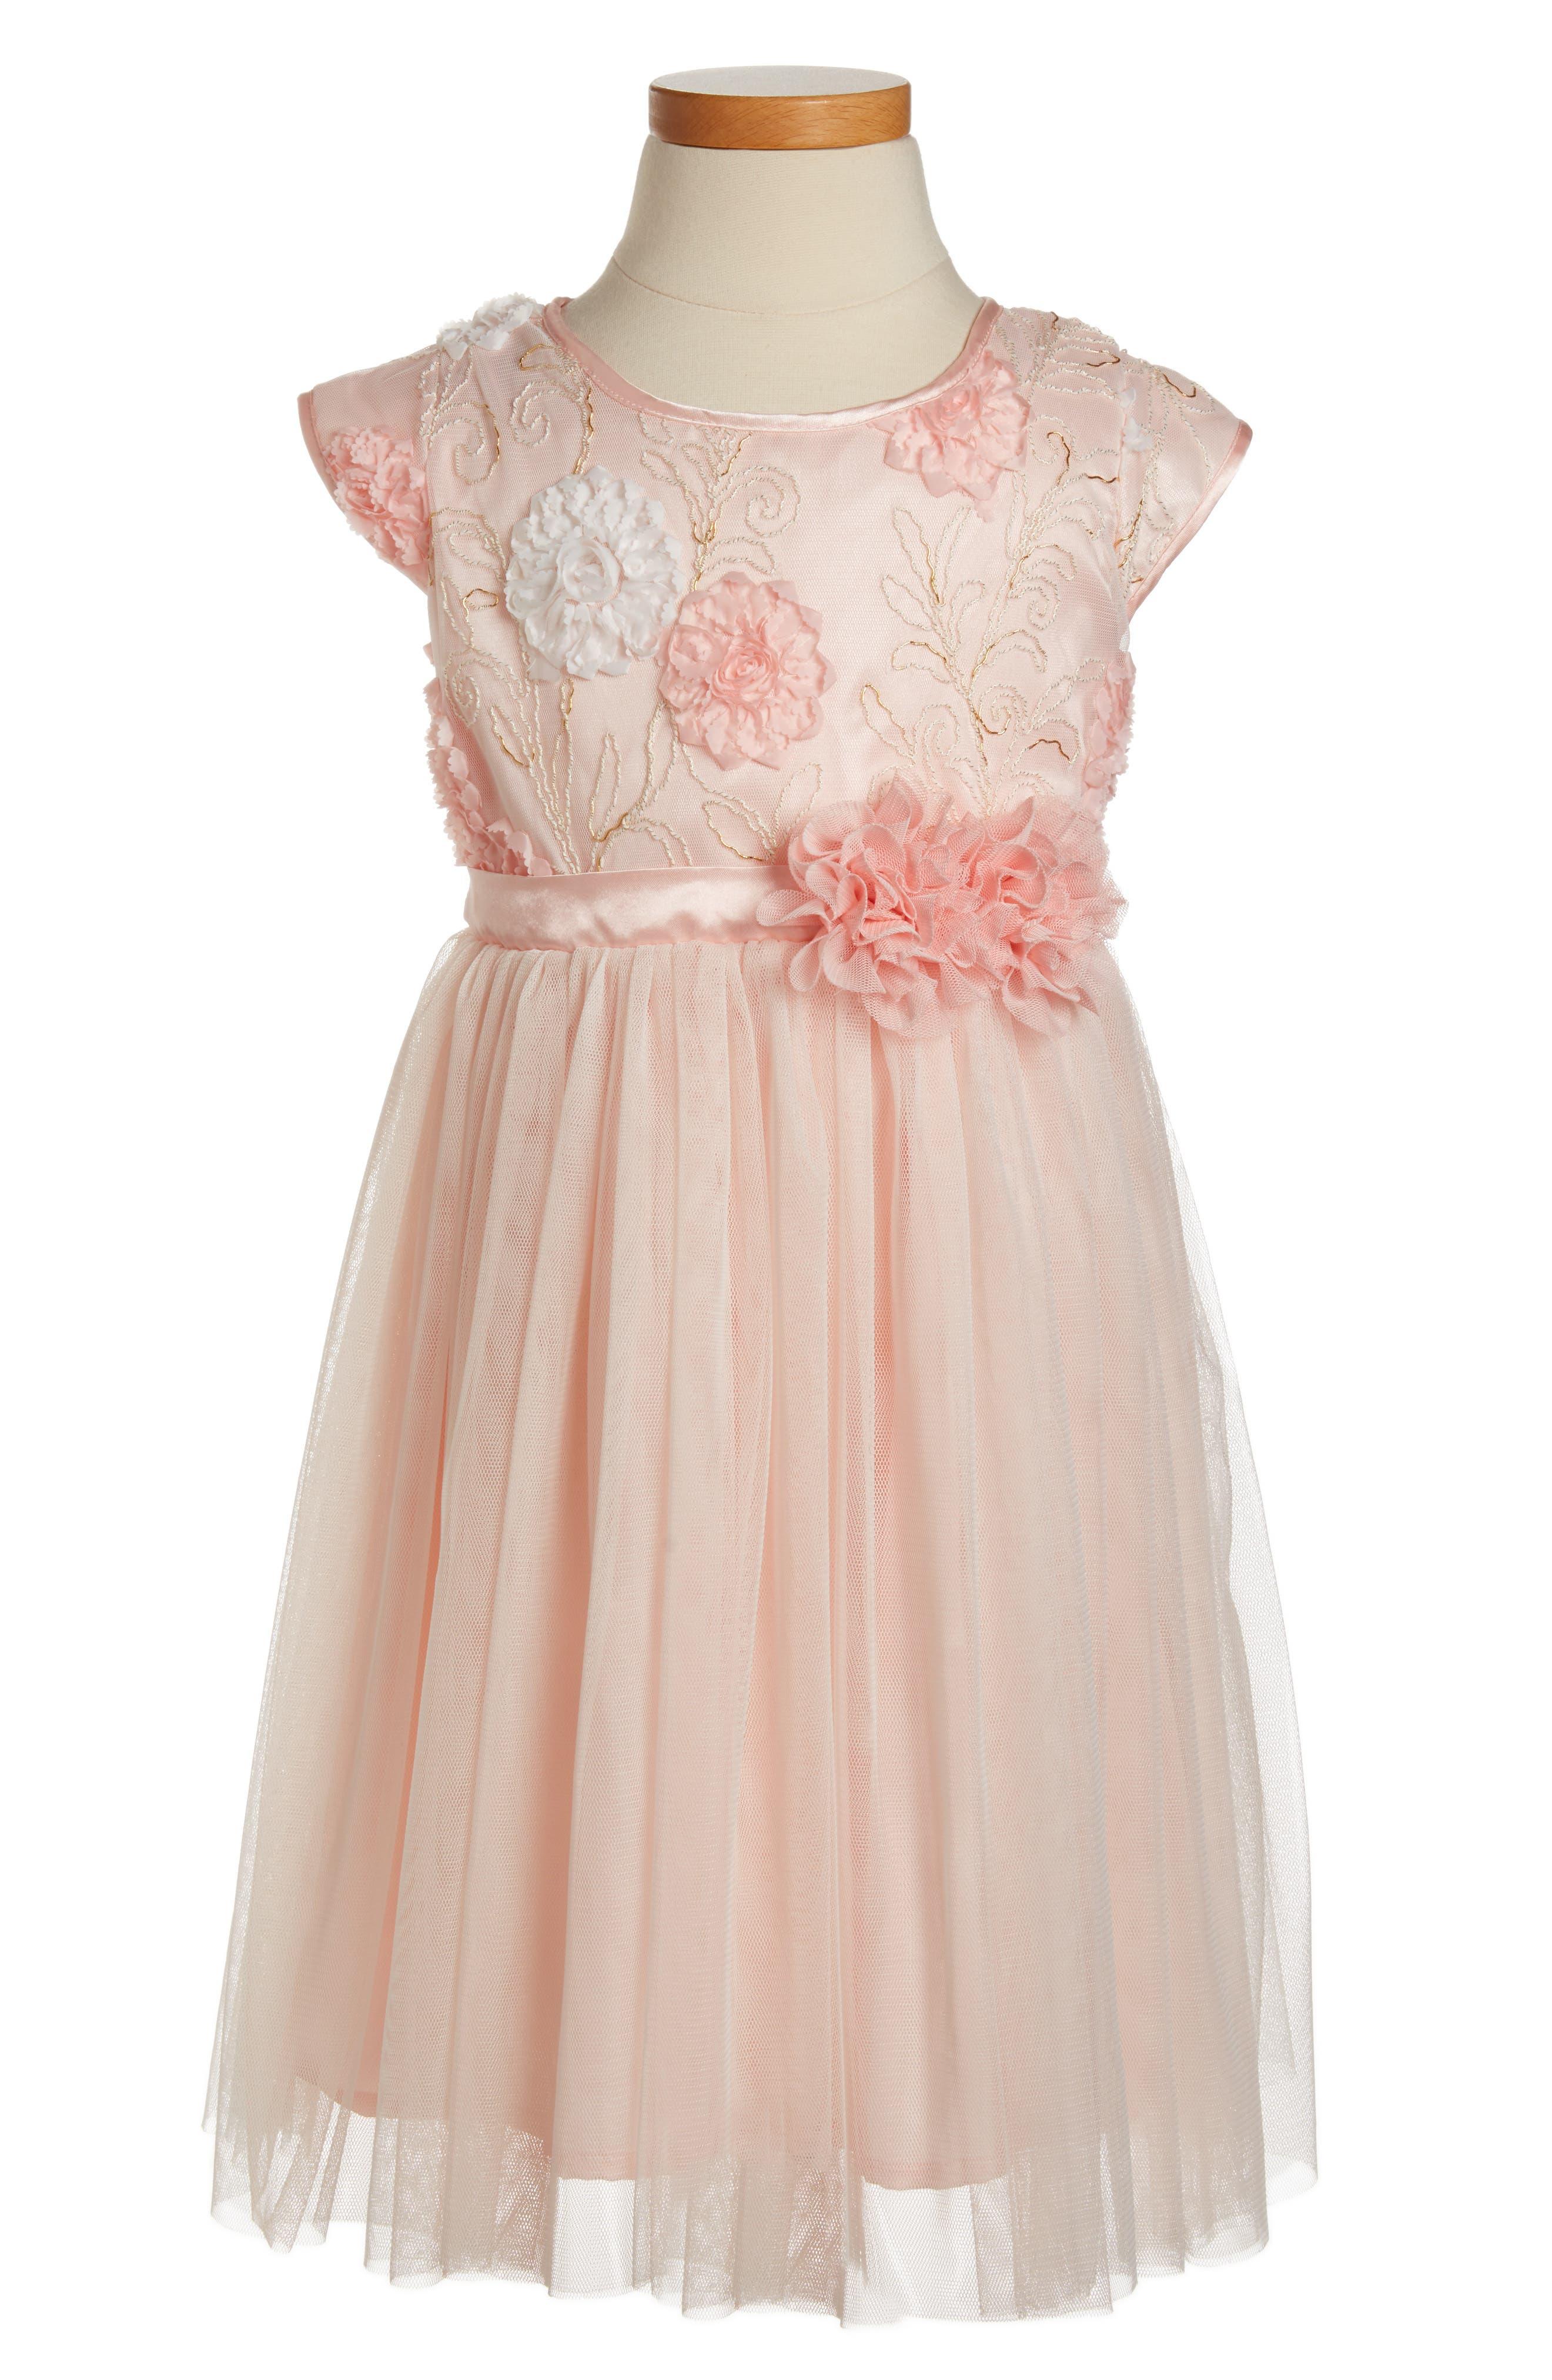 POPATU Golden Trim Flower Dress